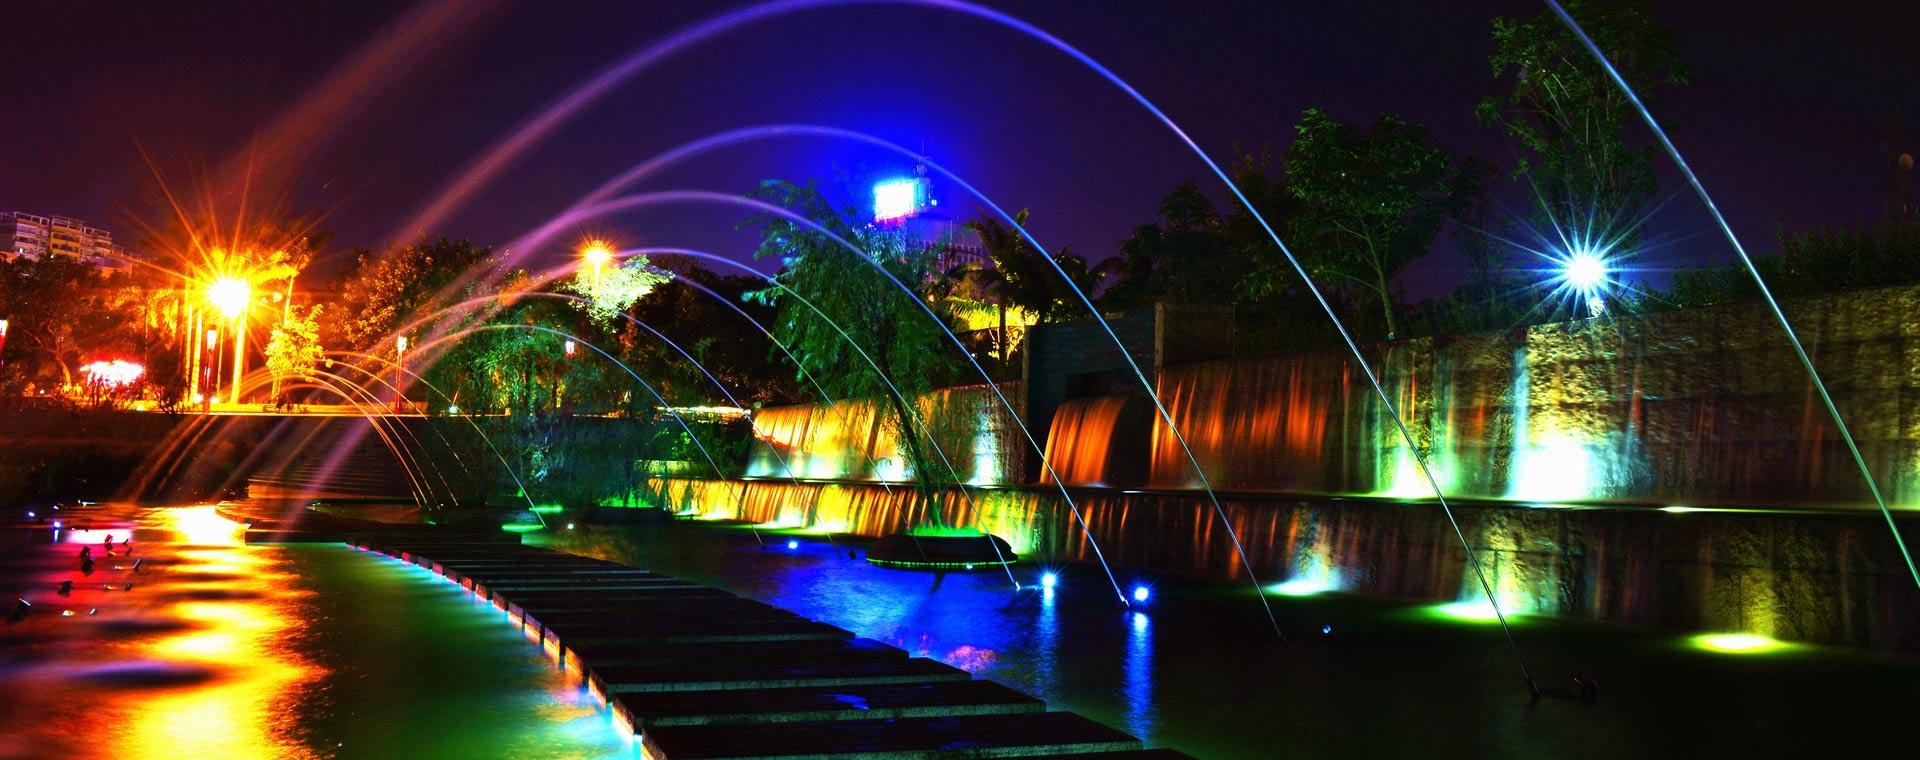 噴泉002